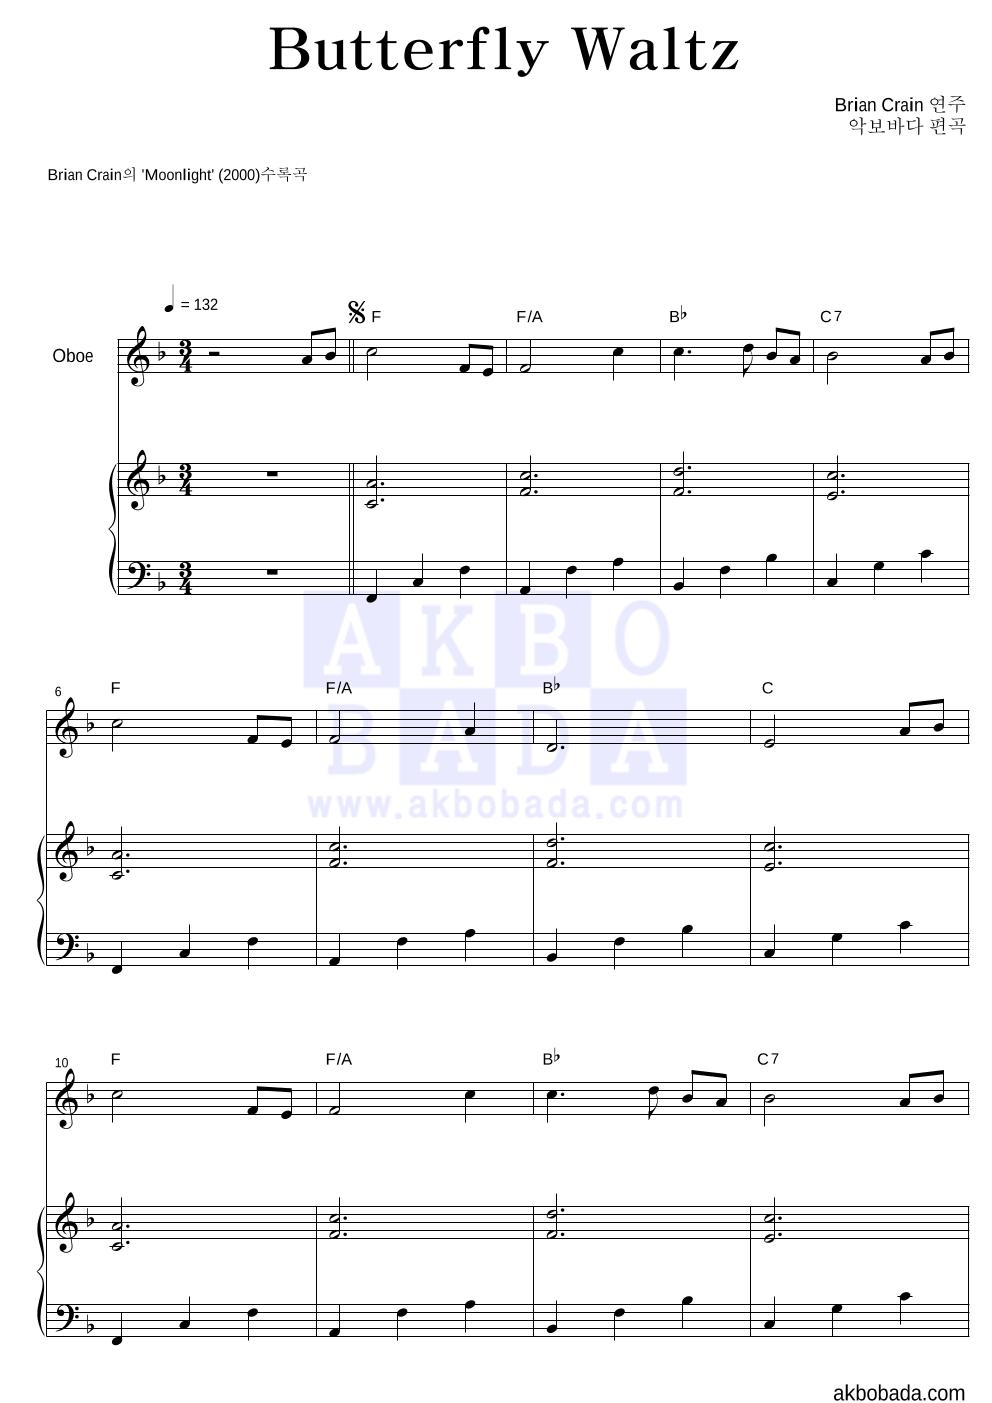 Brian Crain - Butterfly Waltz 오보에&피아노 악보